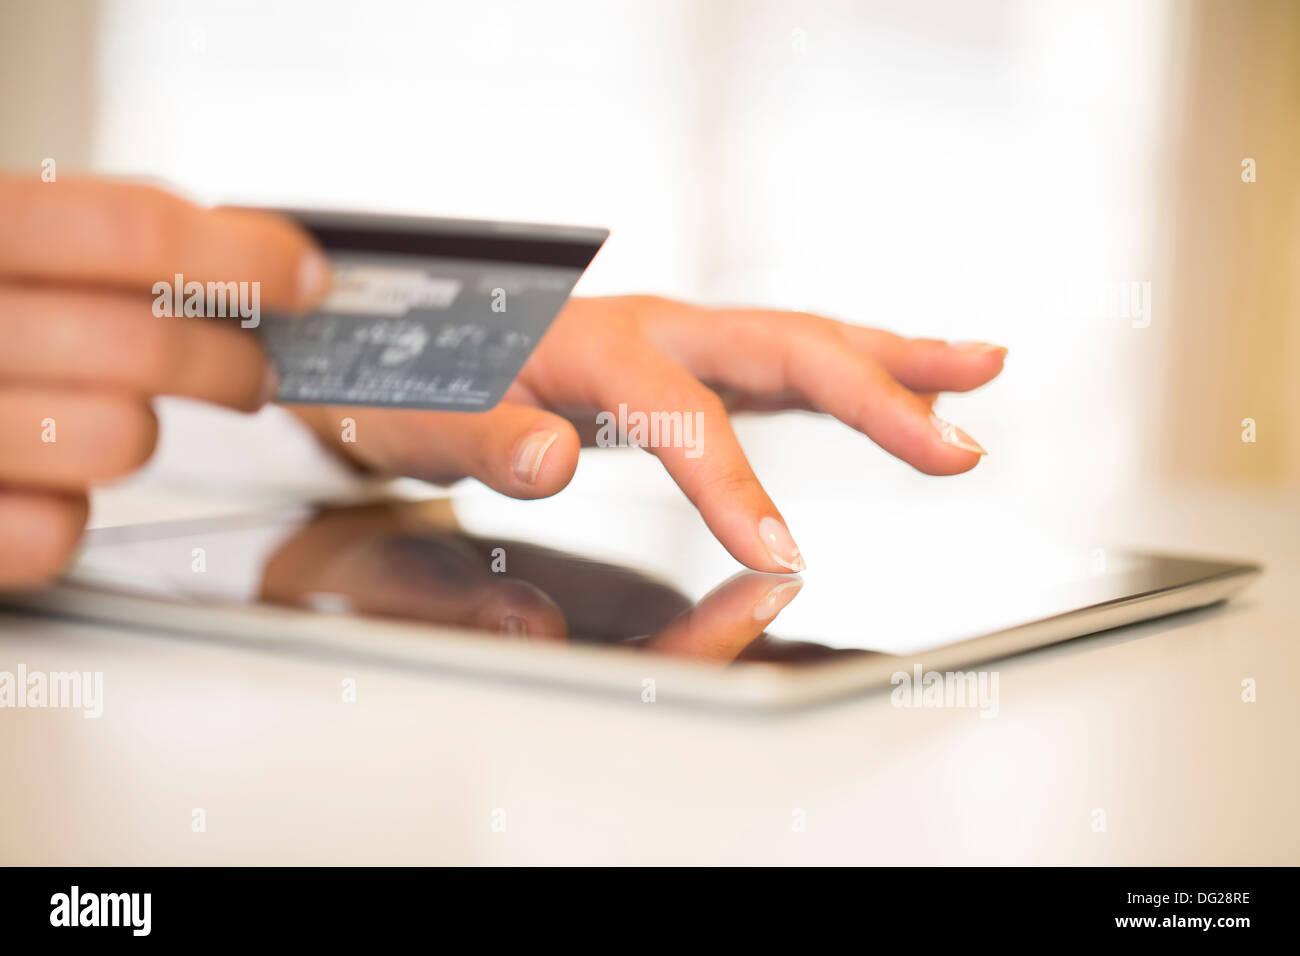 Female computer finger indoor web - Stock Image